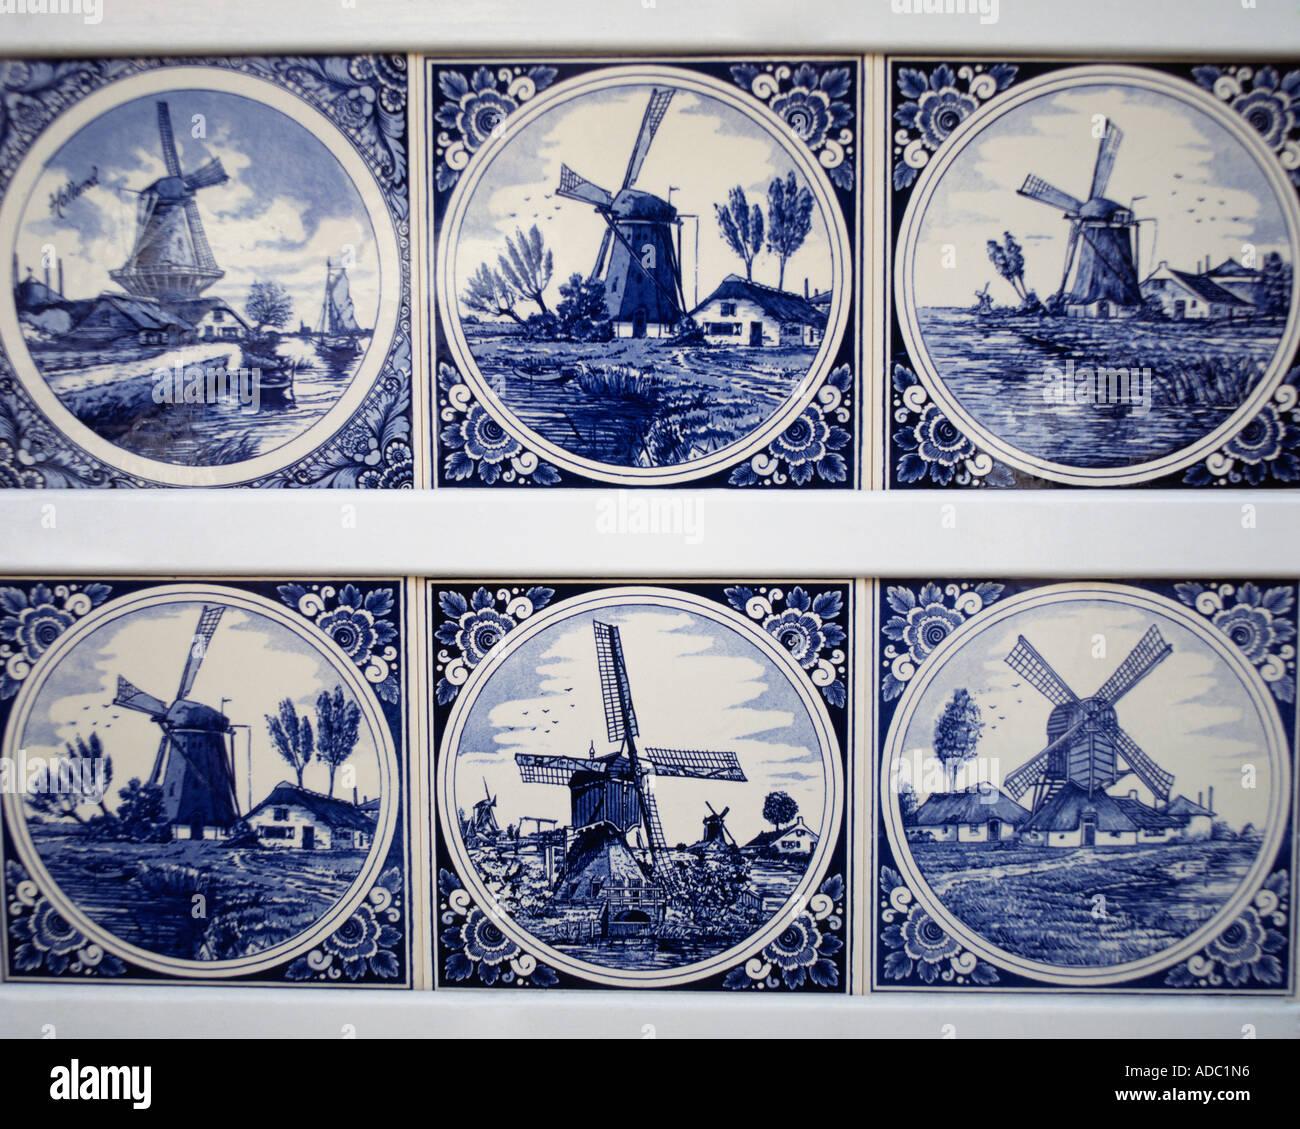 Blue [Delft pottery] tiles Netherlands - Stock Image